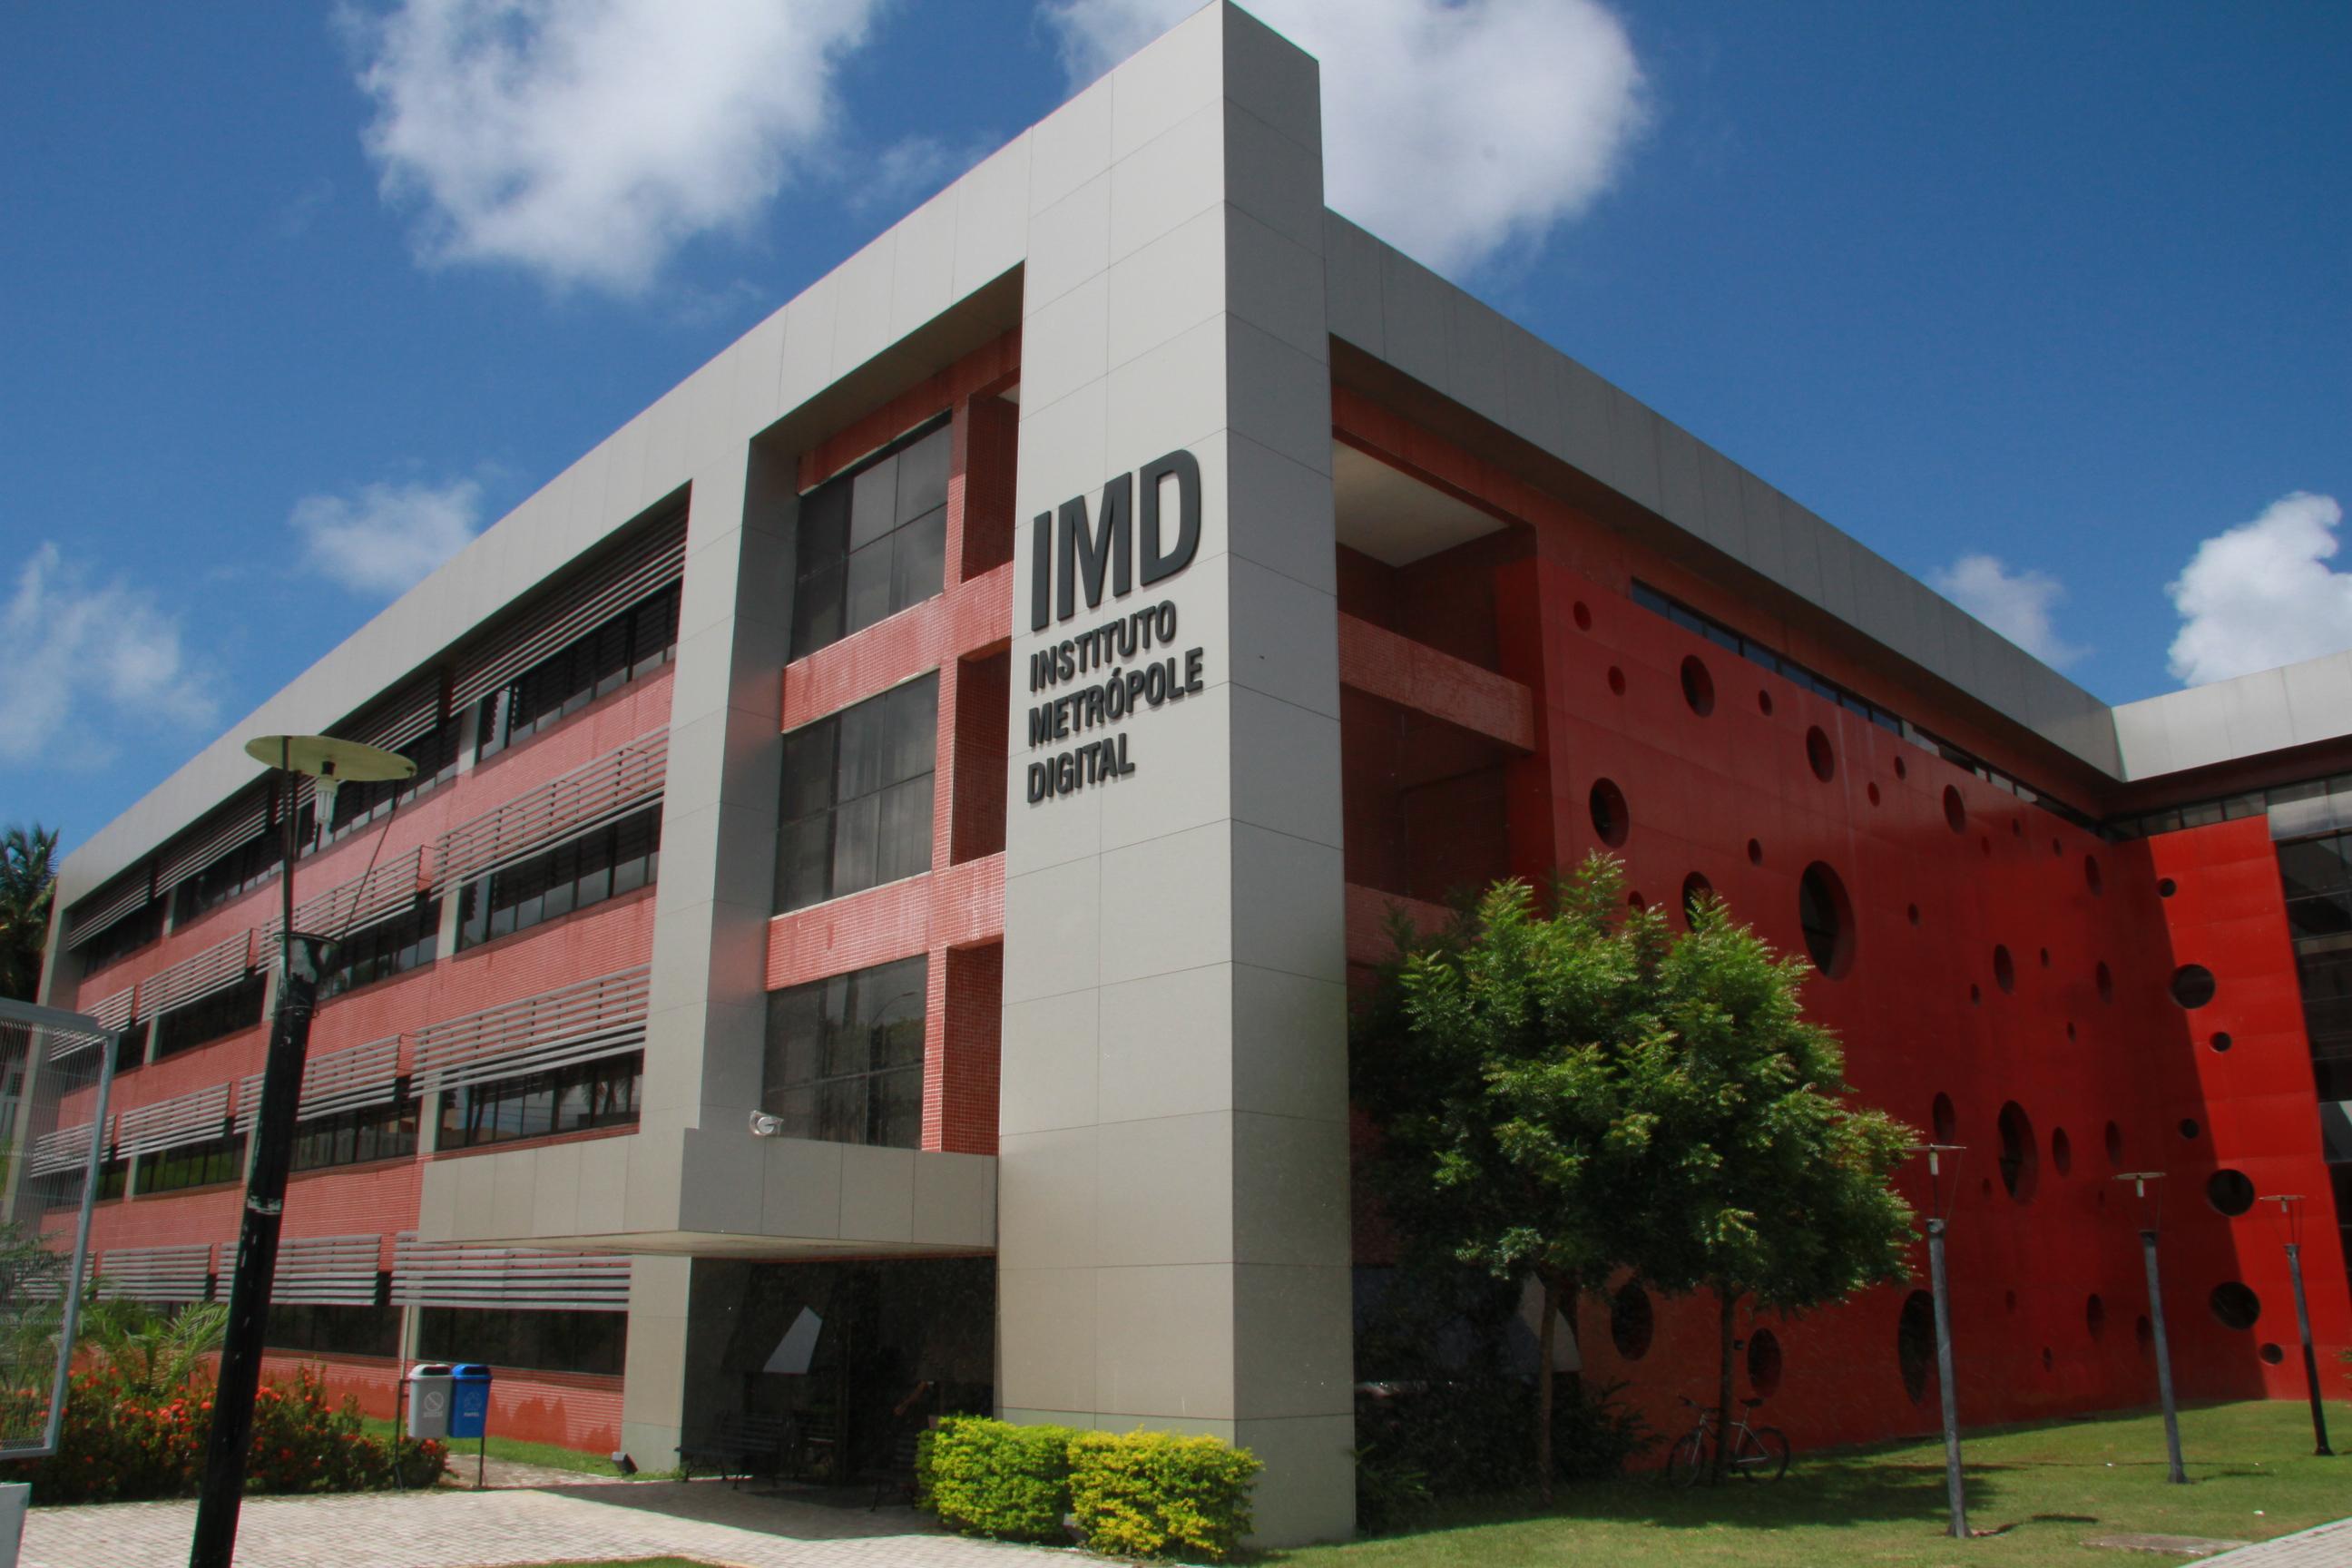 Instituto Metrópole Digital IMD UFRN 6